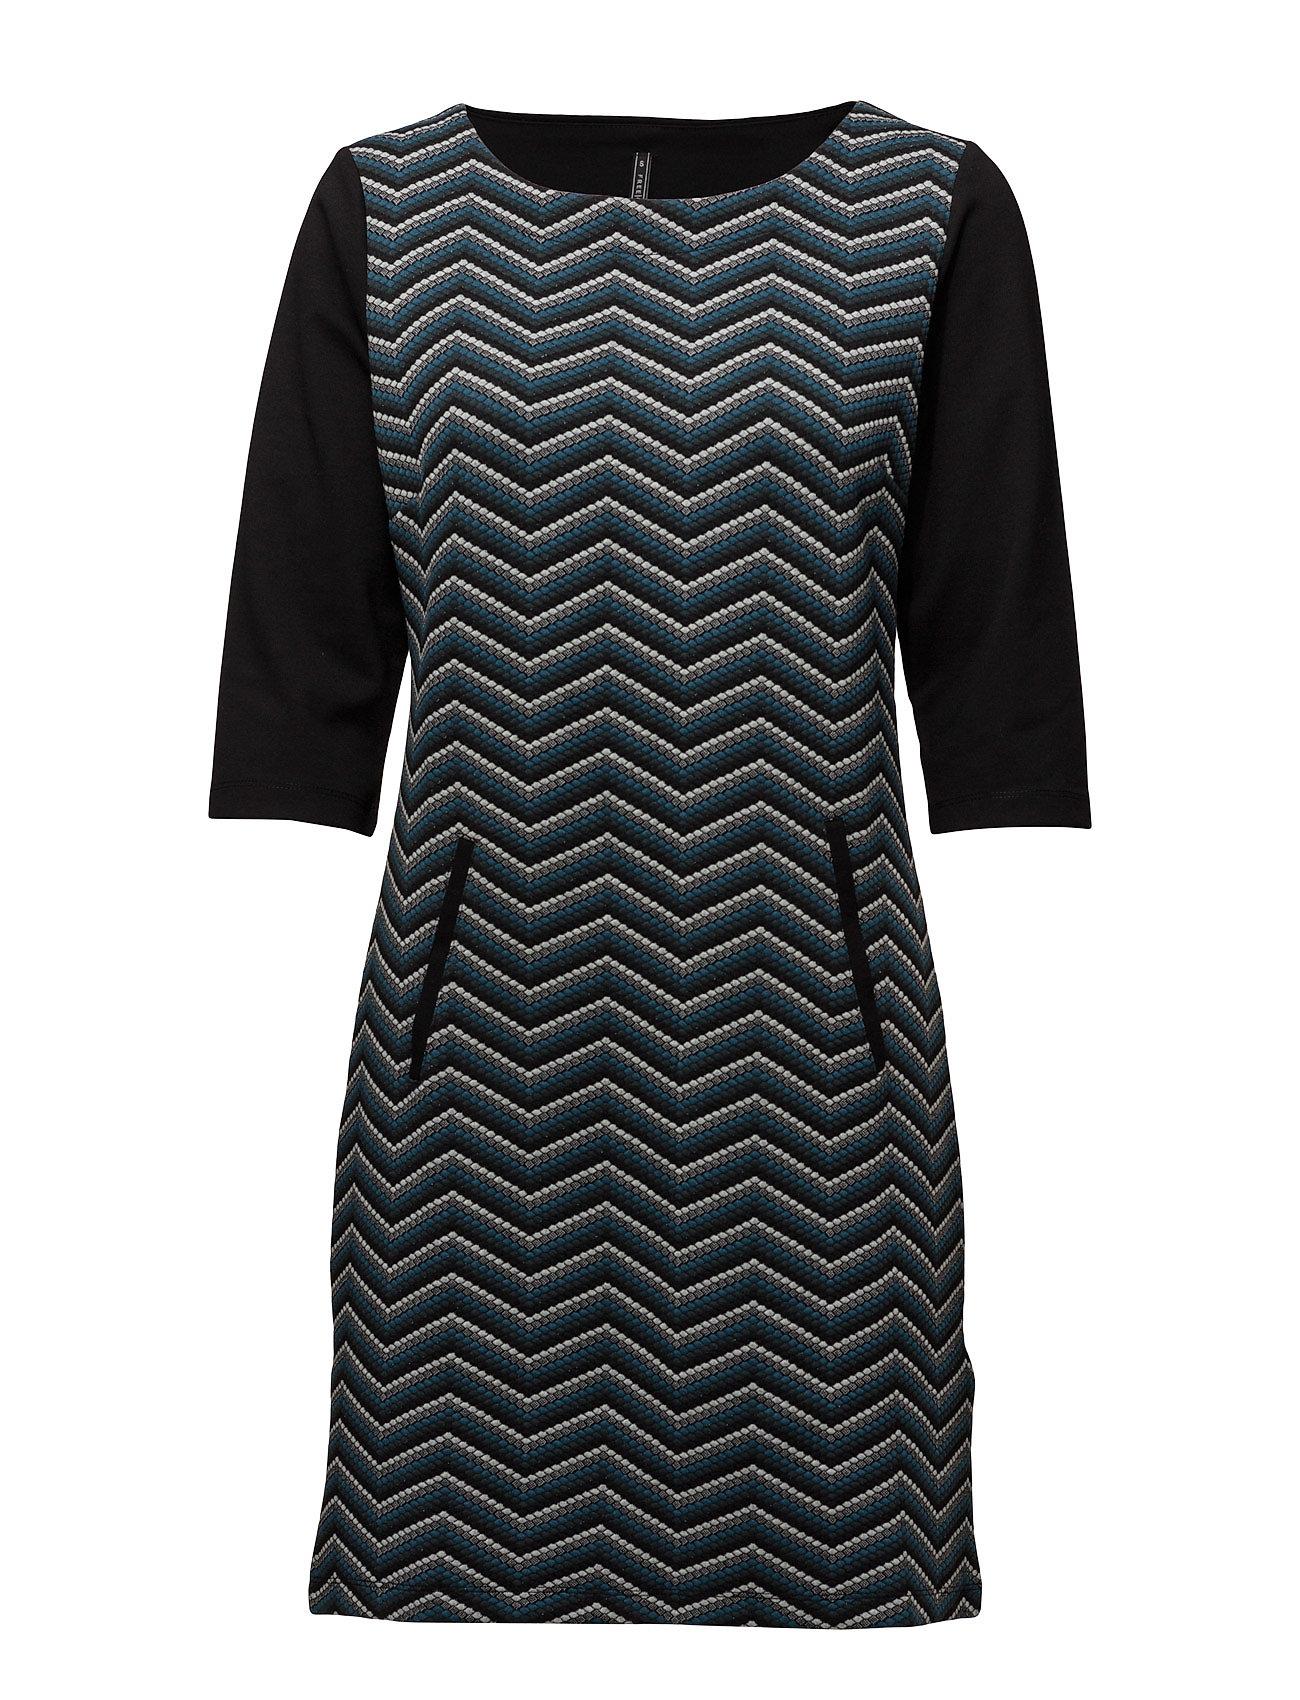 Dane-Dr-3/4-Structure-New FREE|QUENT Korte kjoler til Damer i